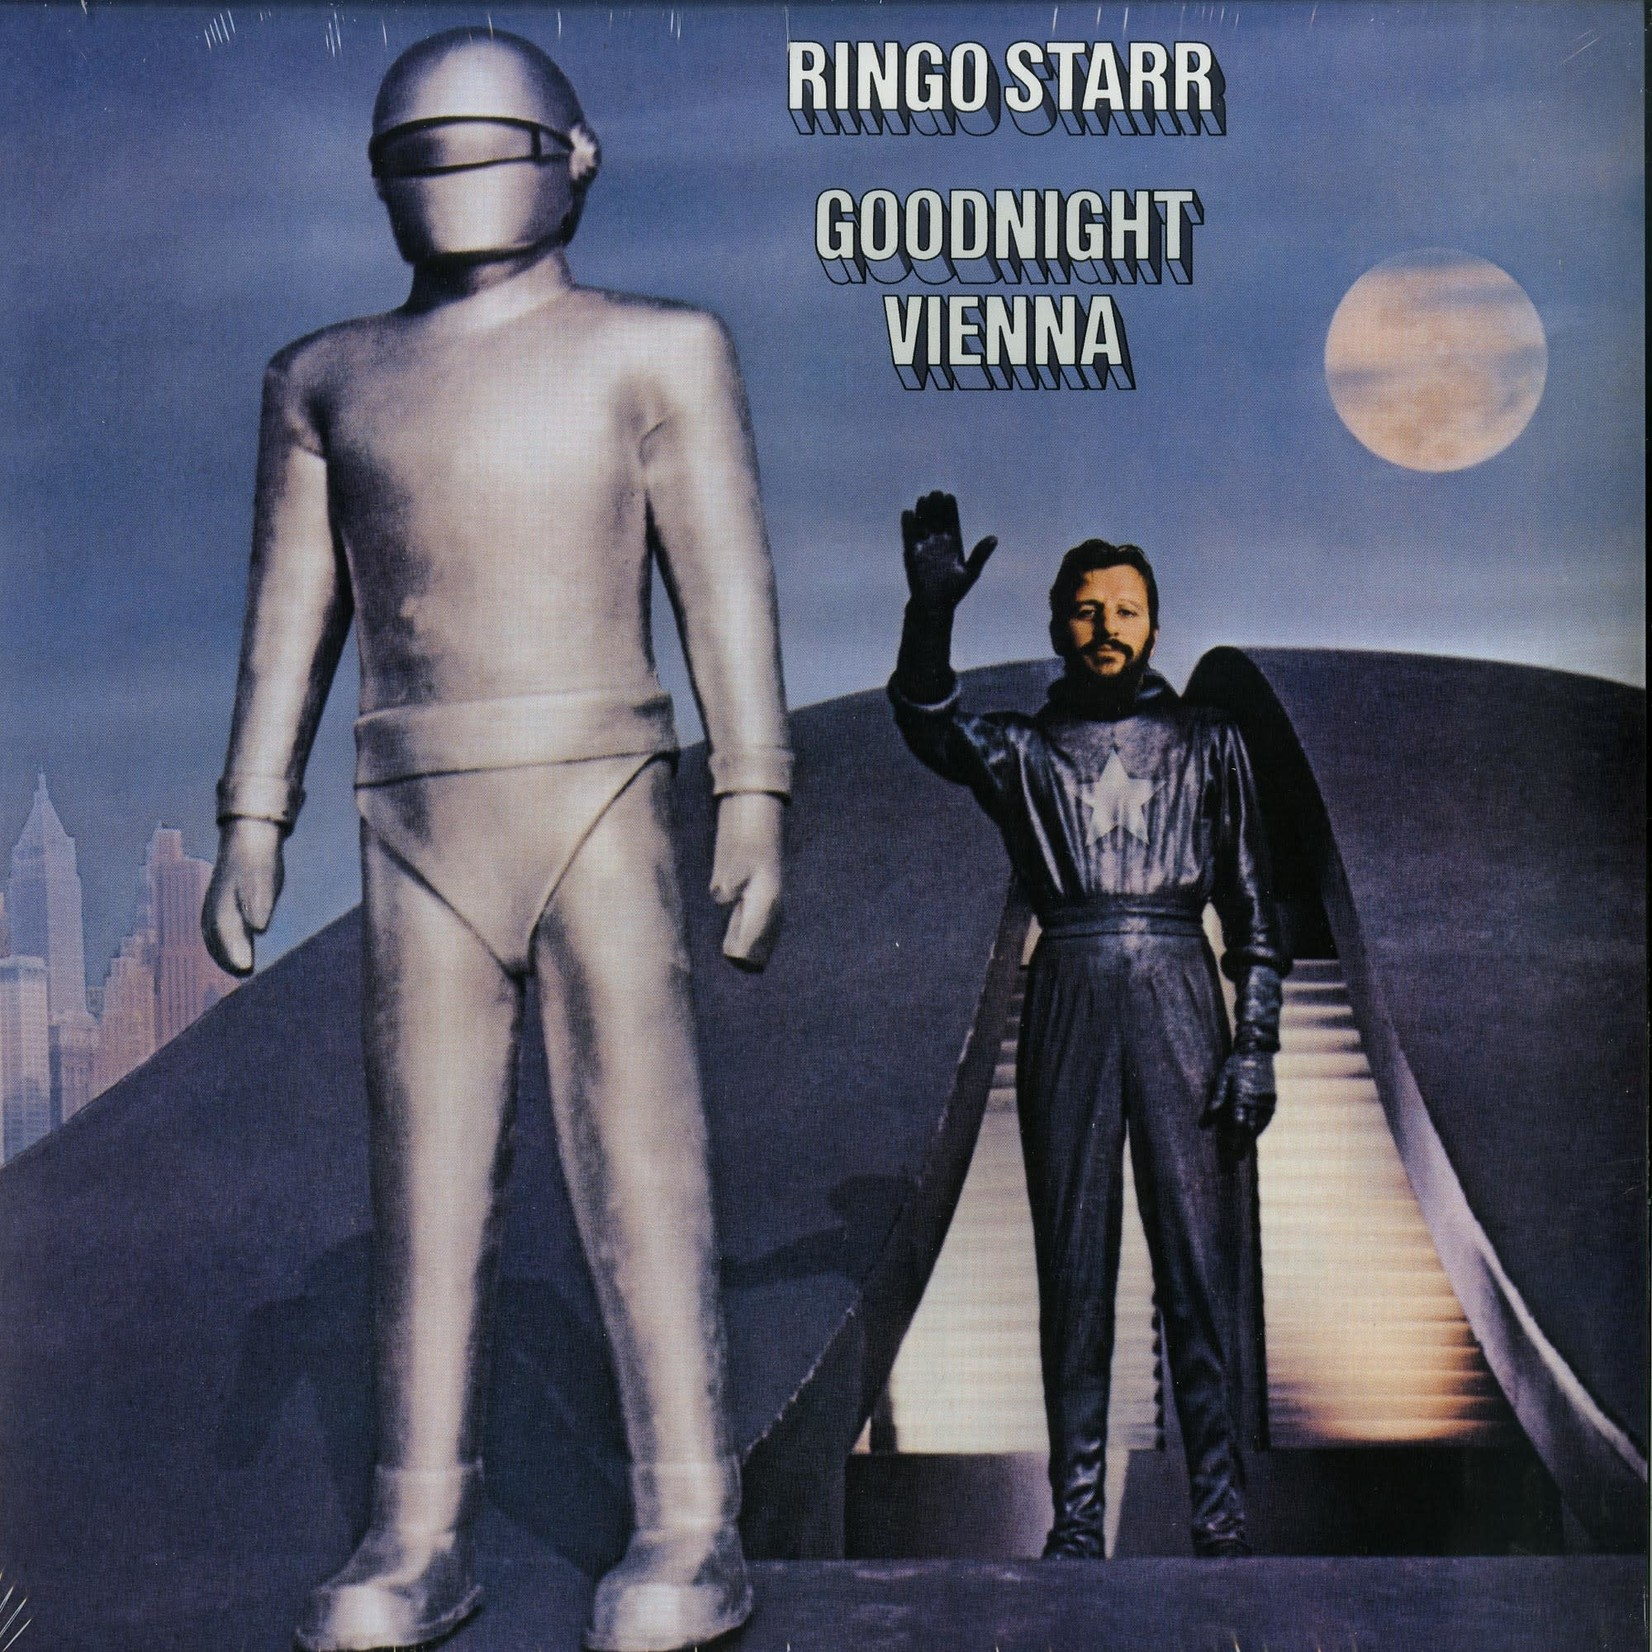 [Vintage] Starr, Ringo: Goodnight Vienna